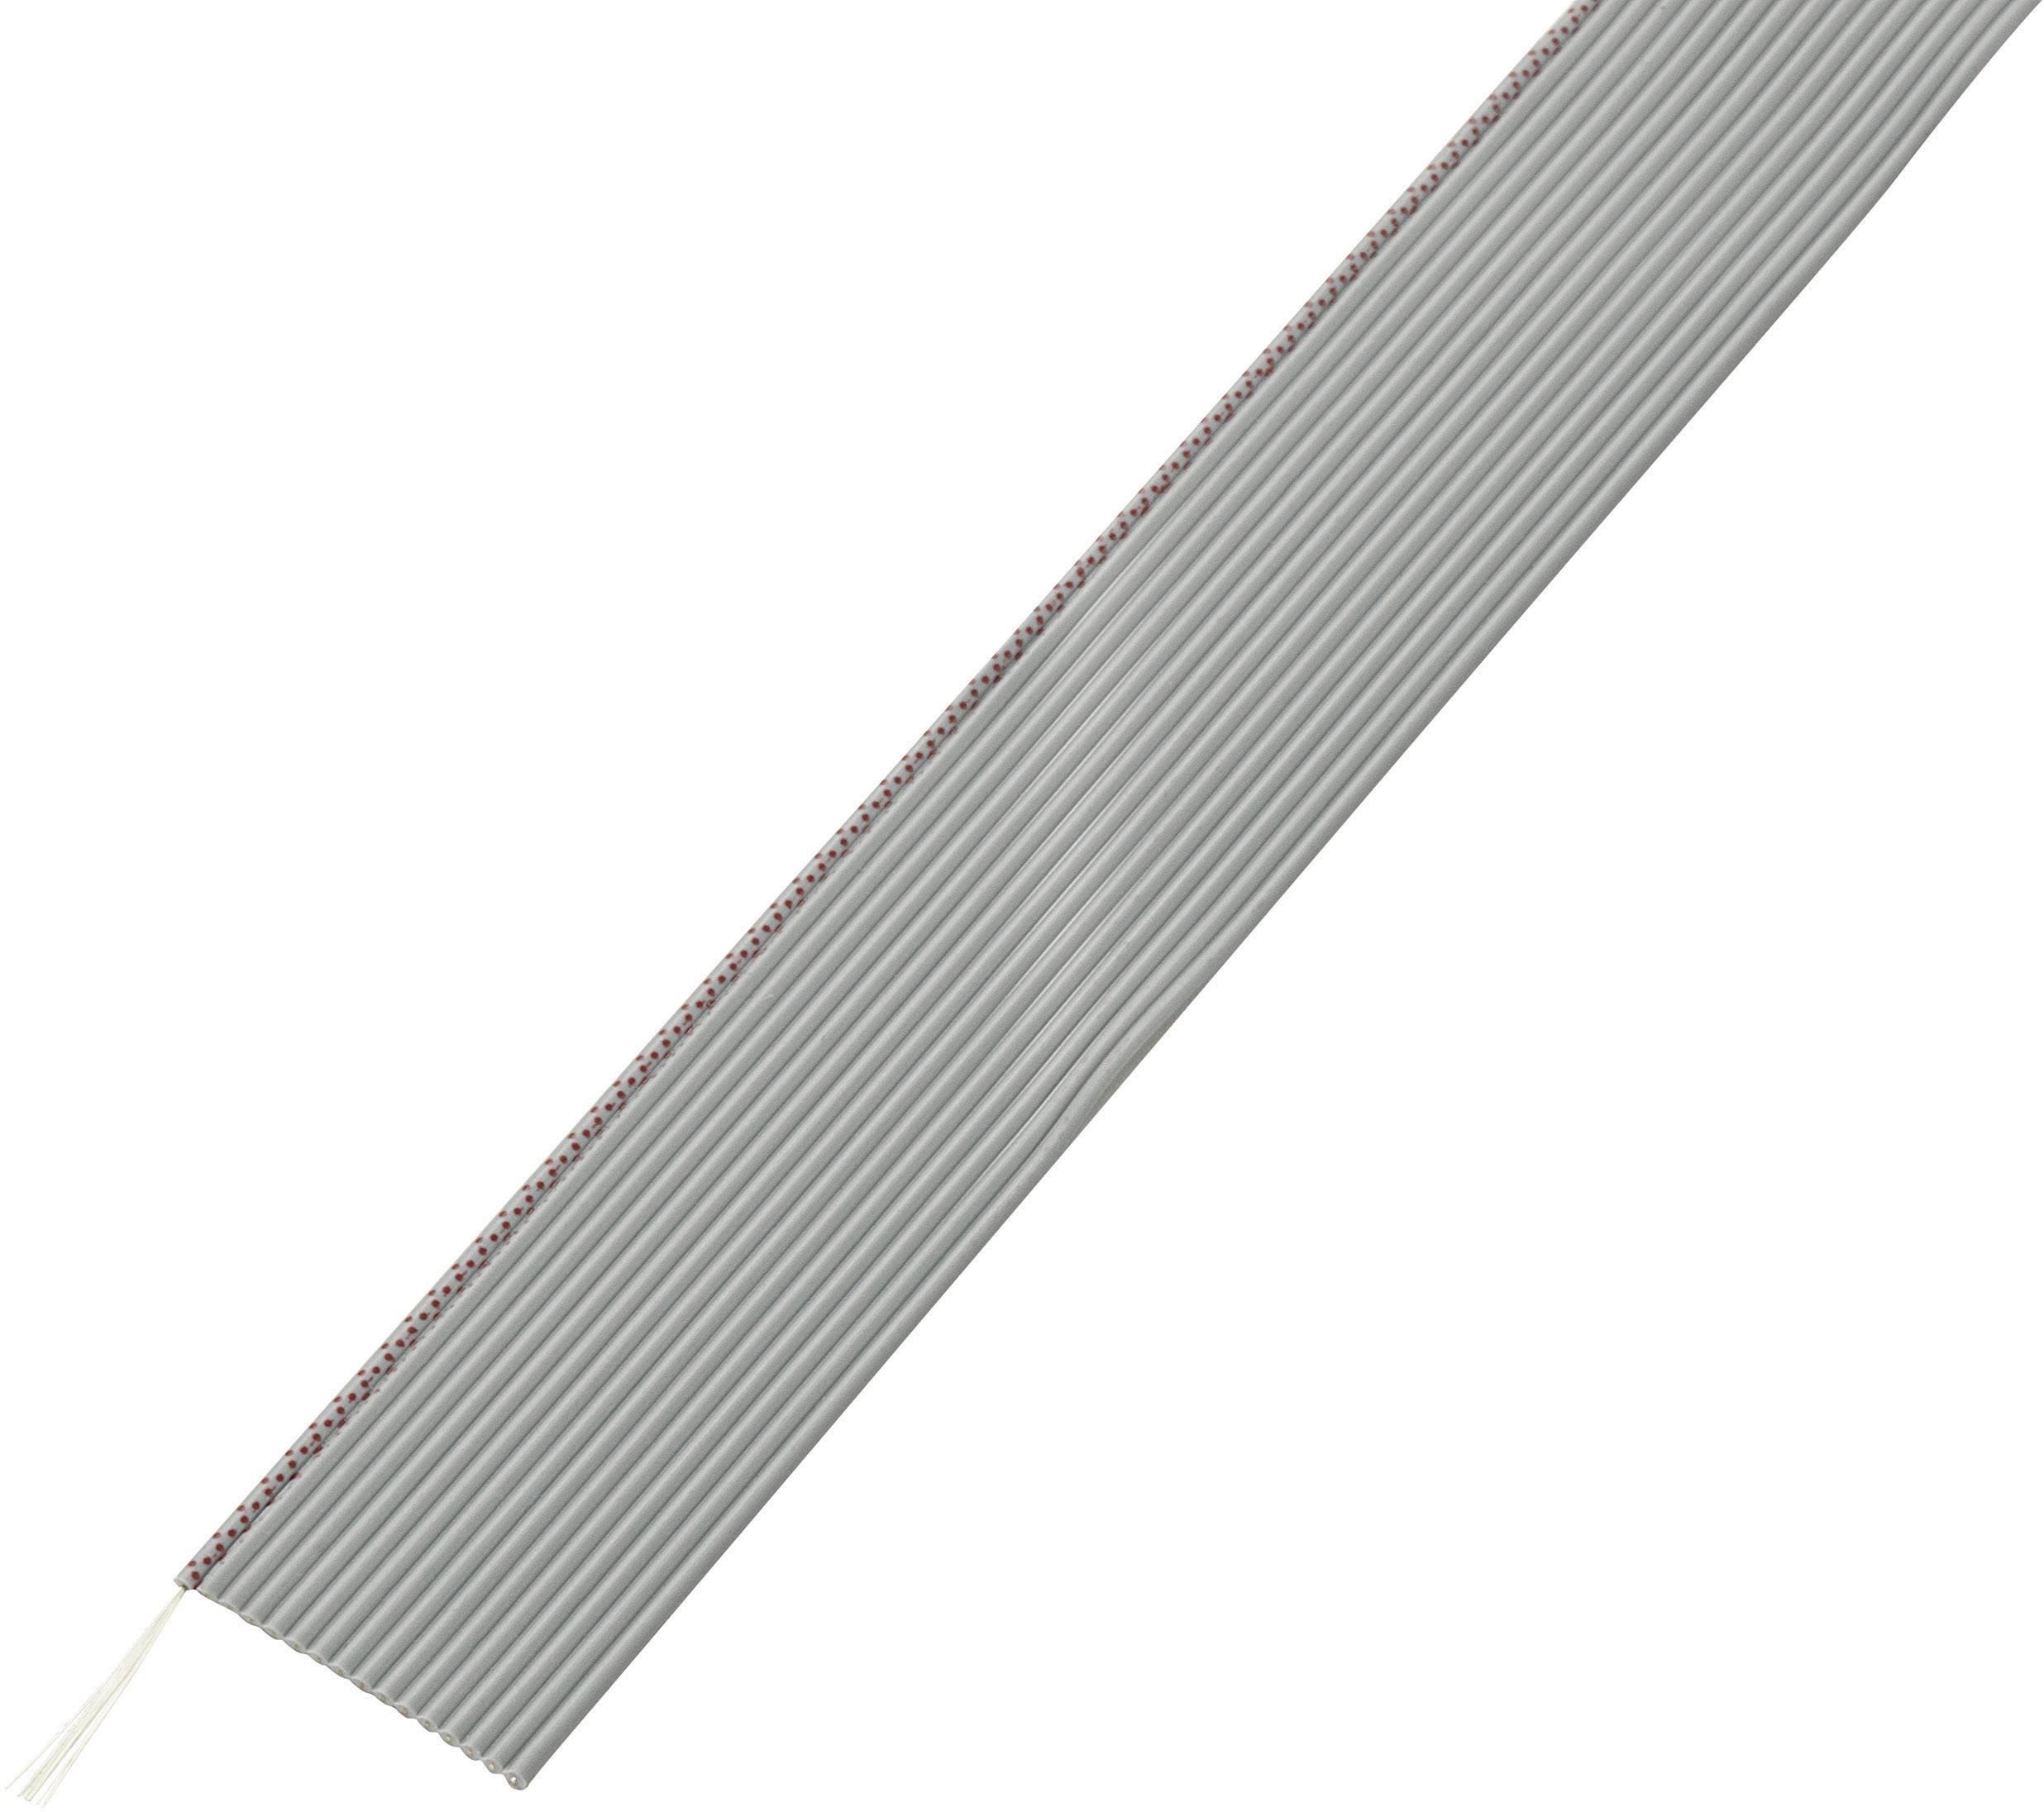 Plochý kabel Flachband cable 16P (SH1998C200), nestíněný, 30.5 m, šedá